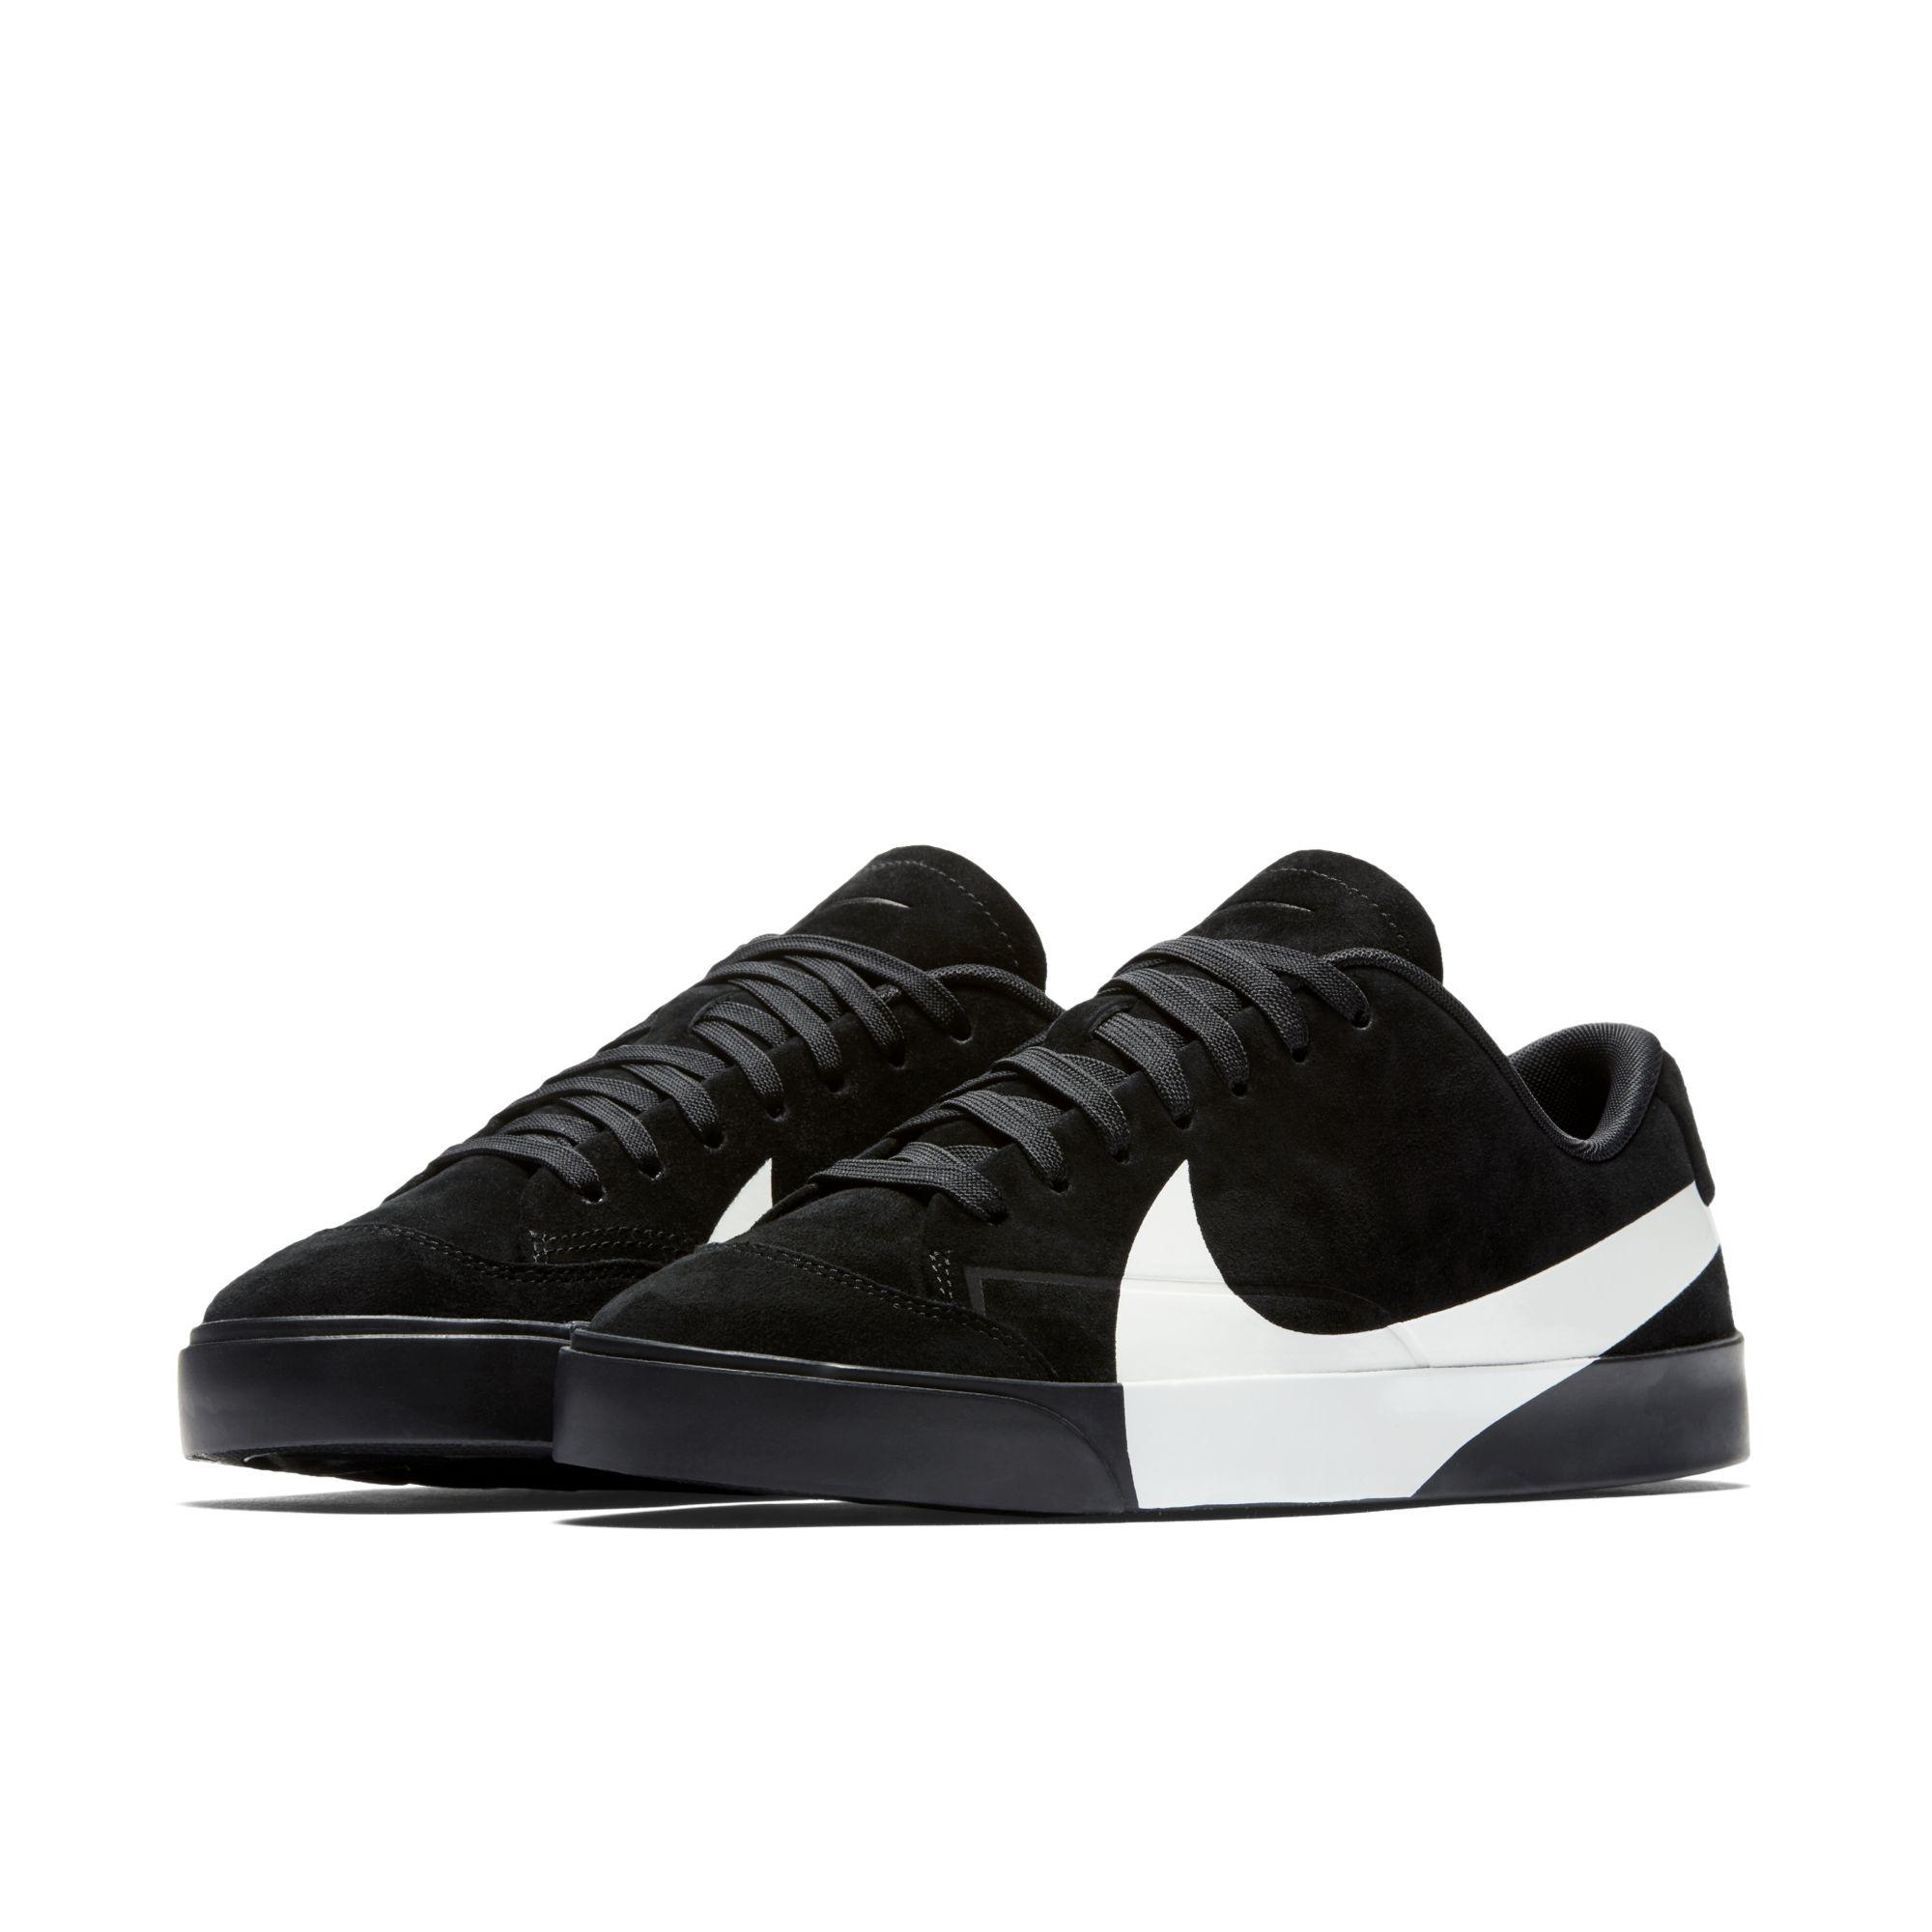 Nike耐克官方BLAZER CITY LOW LX女子运动鞋休闲板鞋大勾子AV2253-001